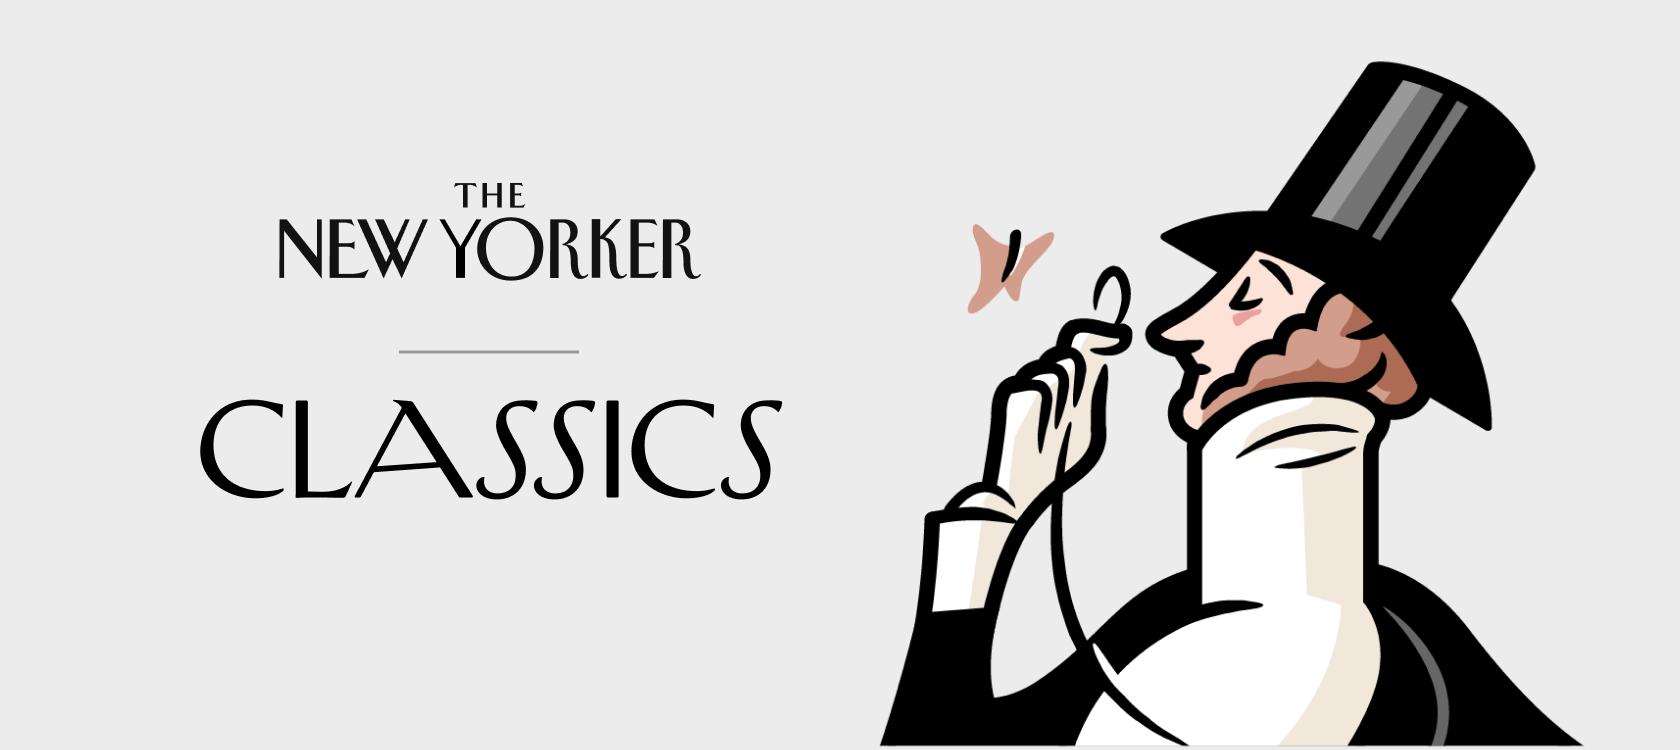 New Yorker Classics